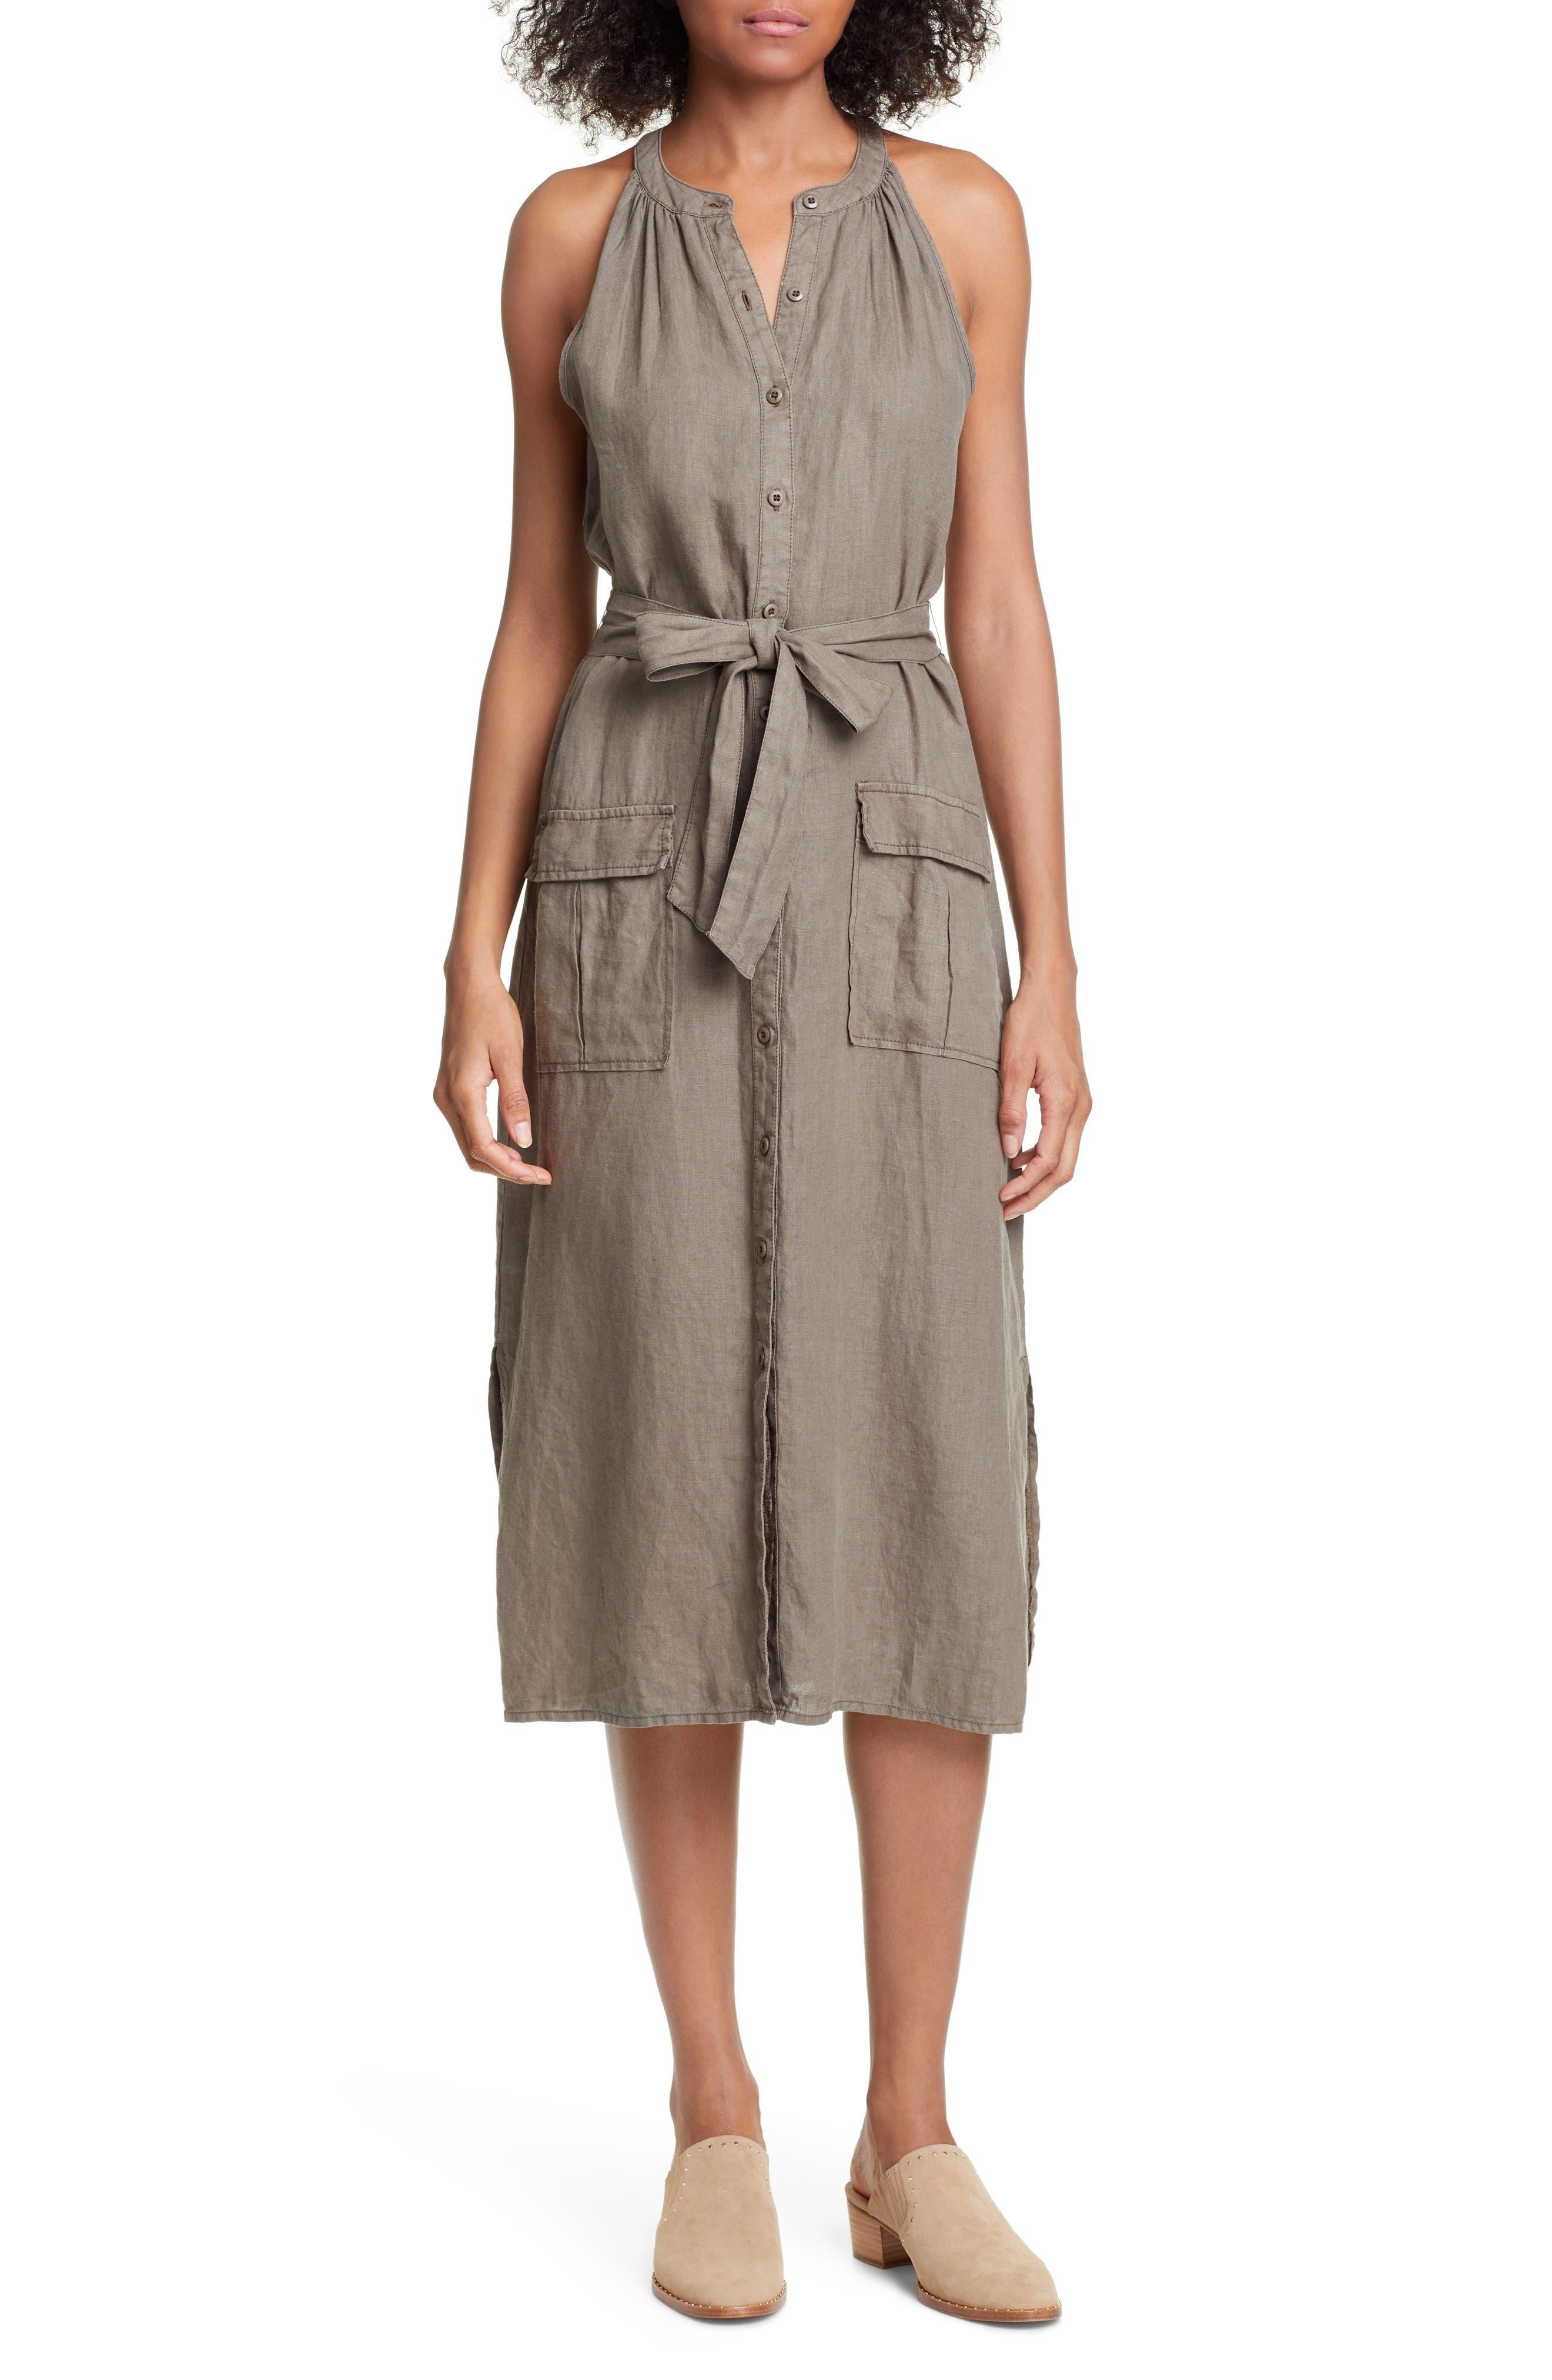 Nordstrom Linen Dress